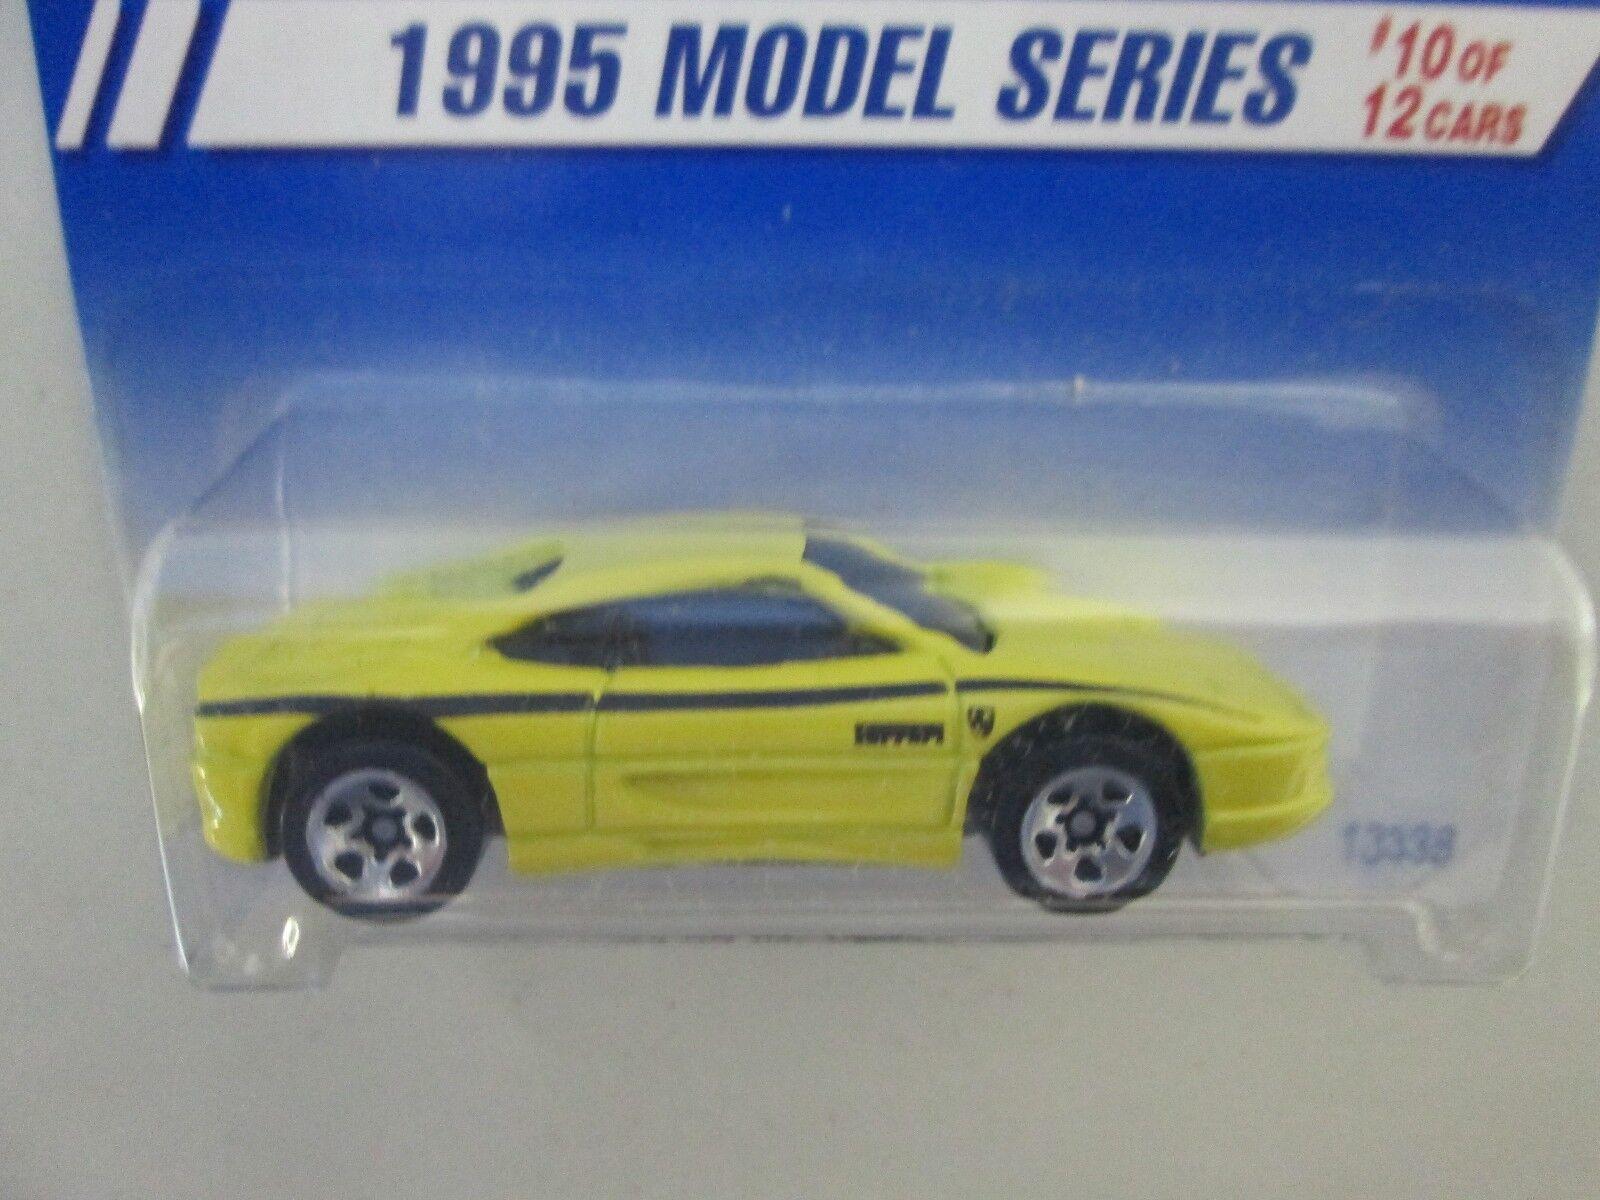 1995 Hot Wheels Wheels Wheels 1995 Modelo Serie Ferrari 355 Ferrari Tampo Raro bd96a0